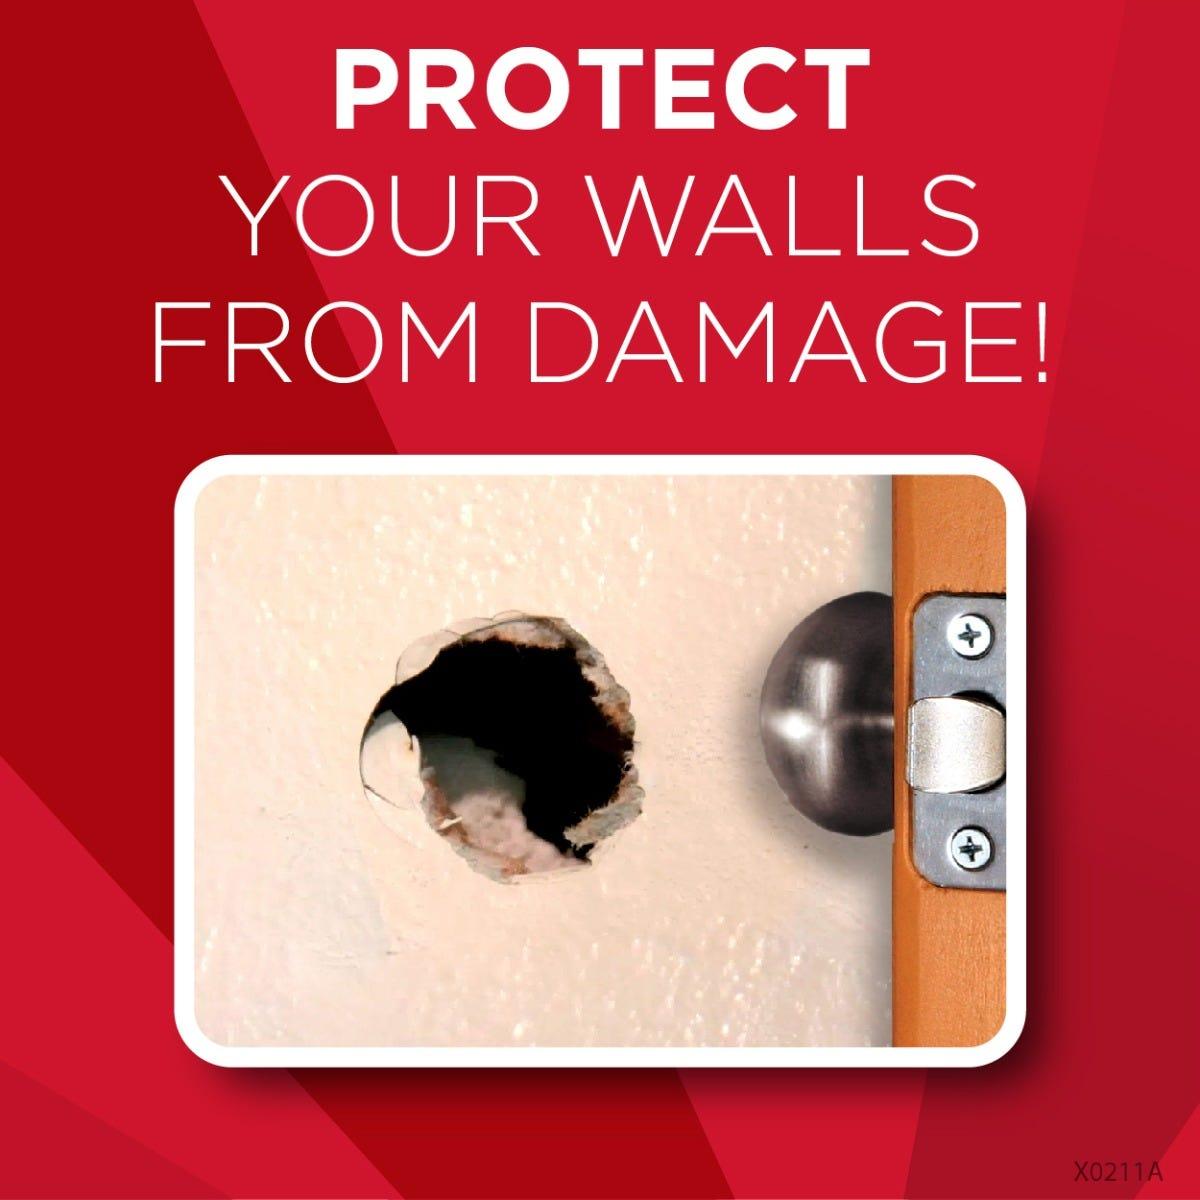 https://googone.com/media/catalog/product/p/r/protect_walls_from_damage.jpg